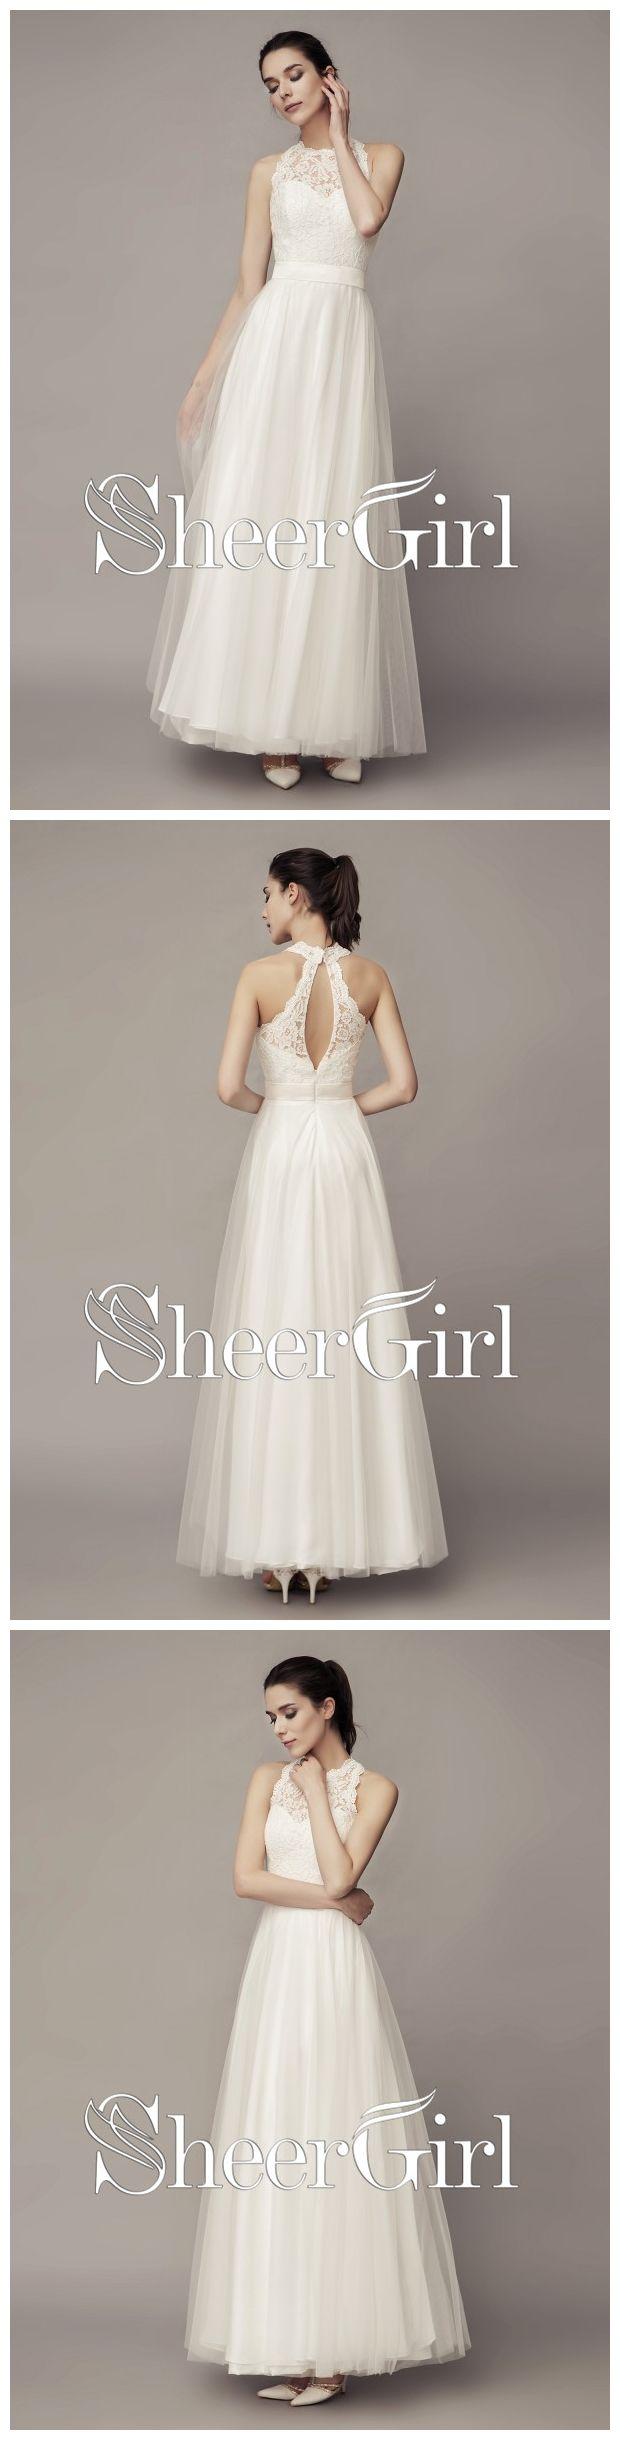 Simple cheap beach wedding dresses lace tulle summer wedding dresses